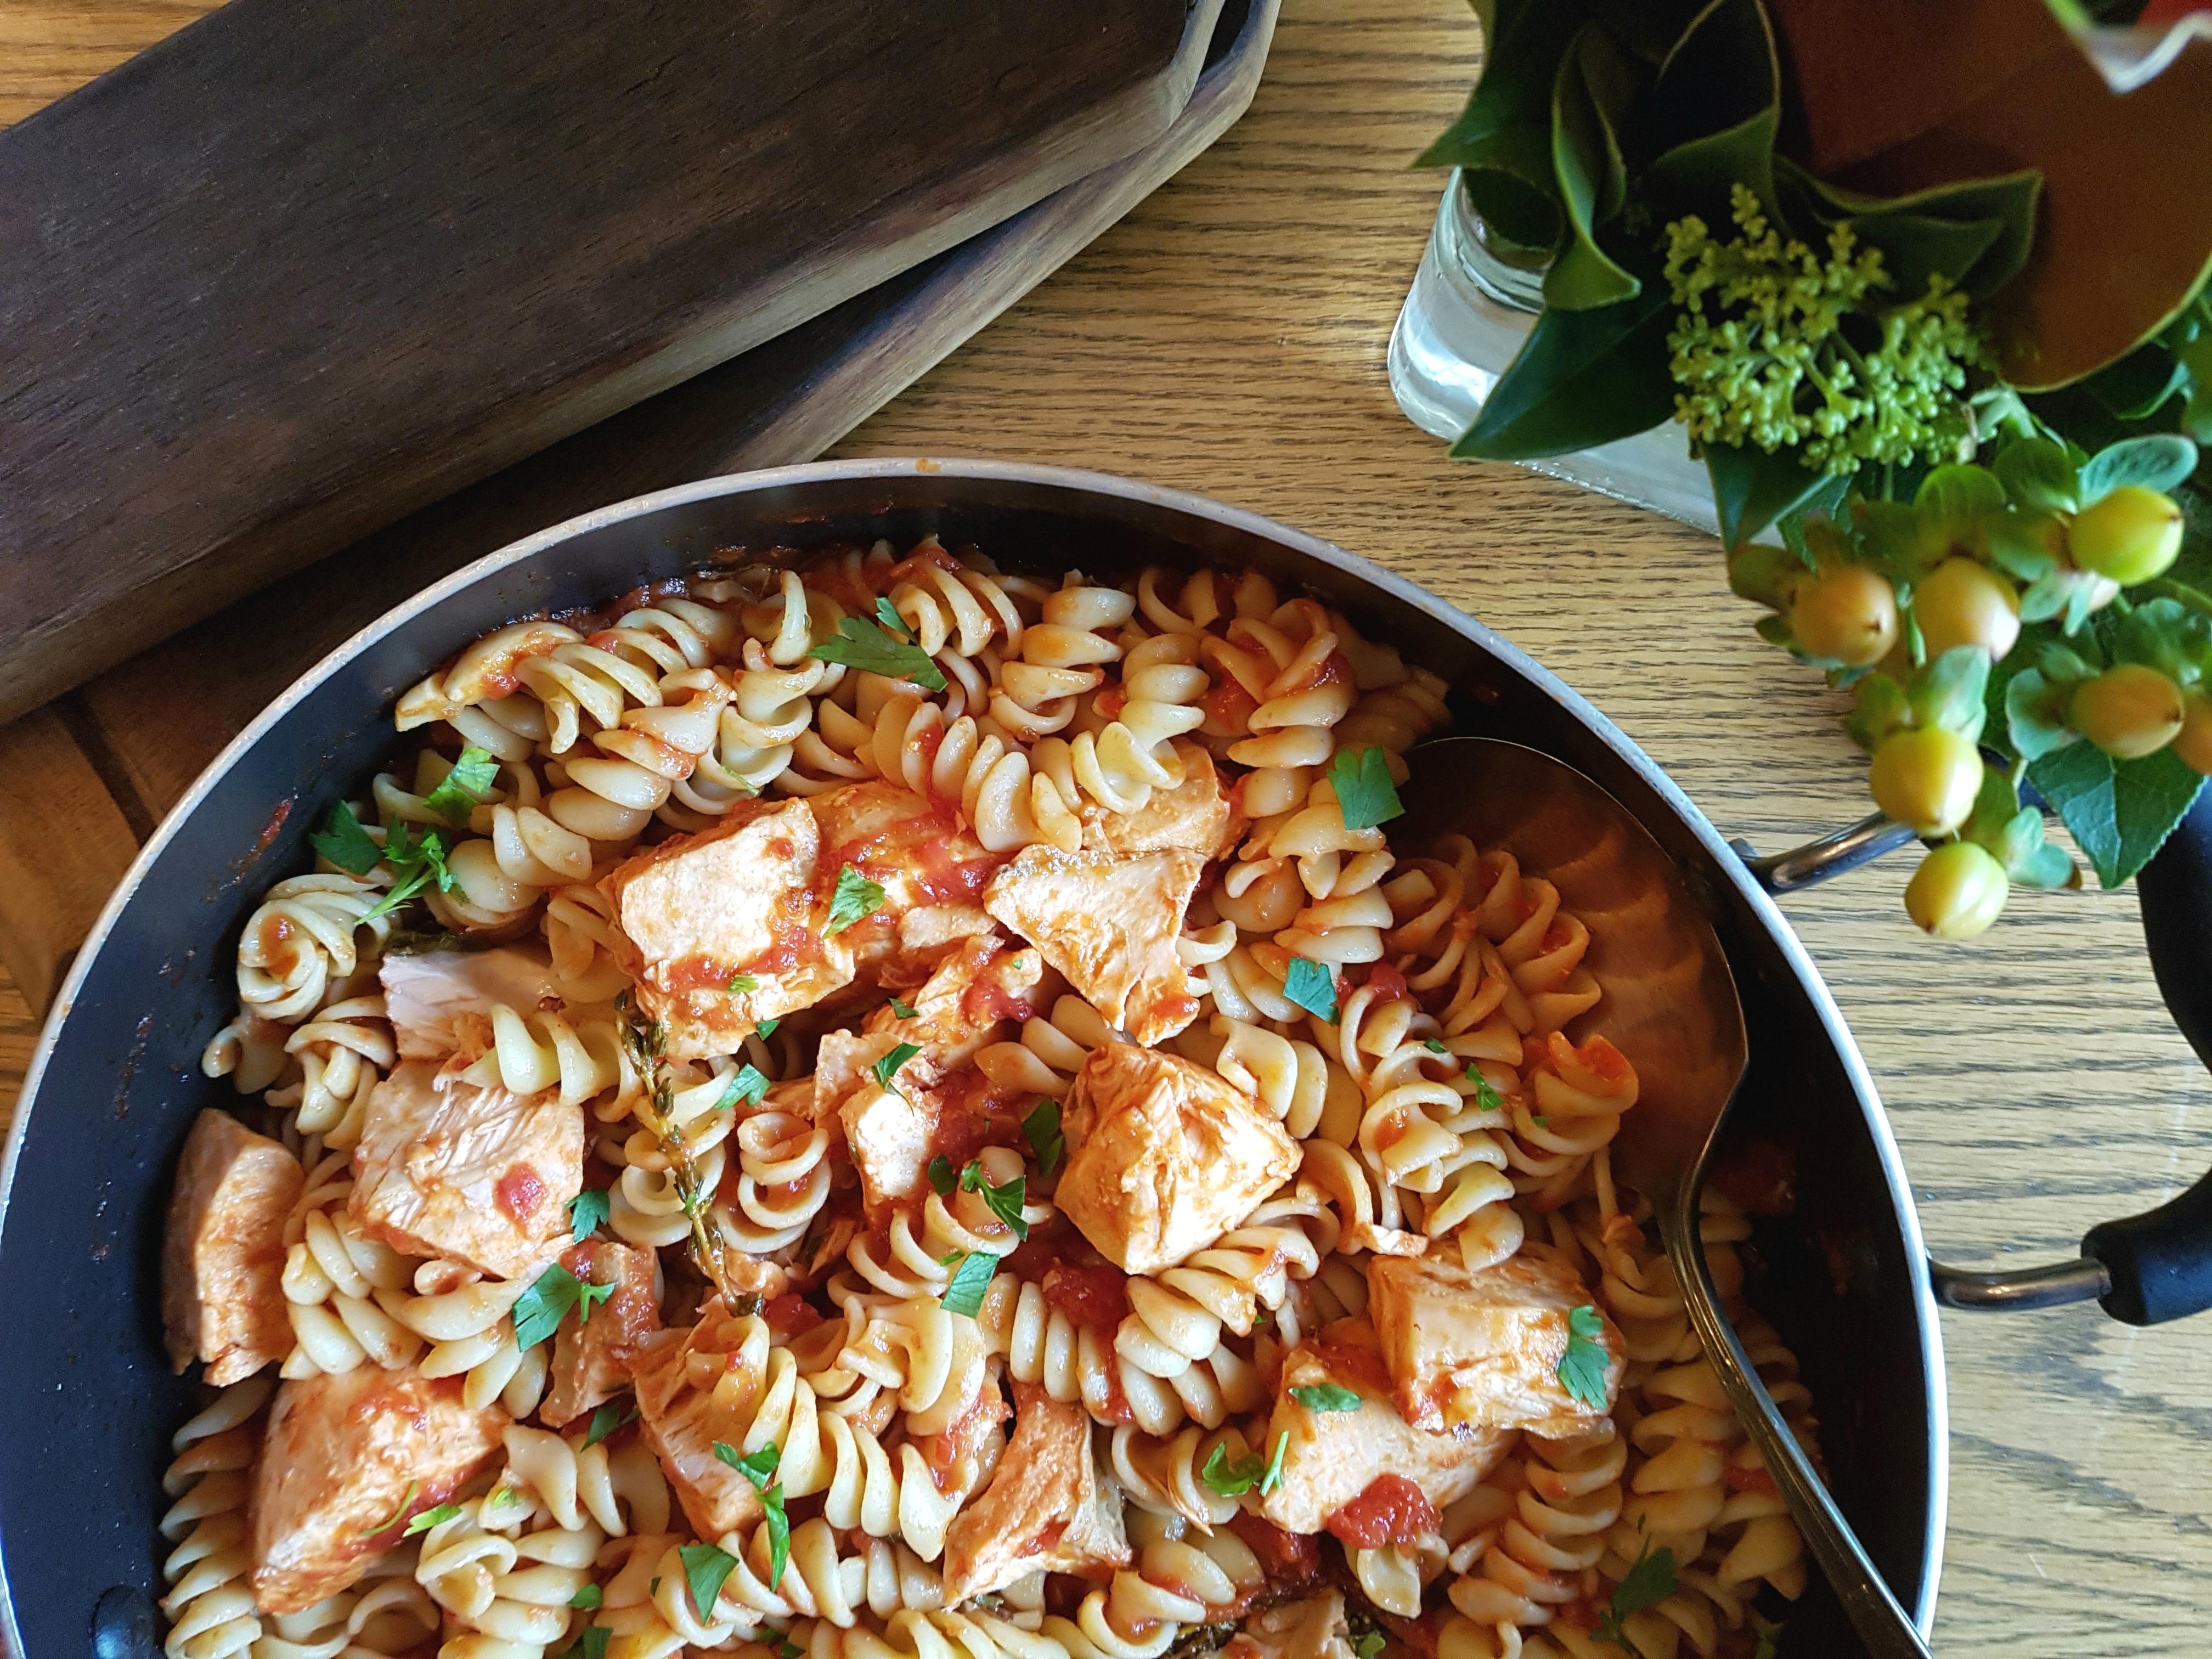 Cooked salmon, fusilli pasta, herbs in skillet